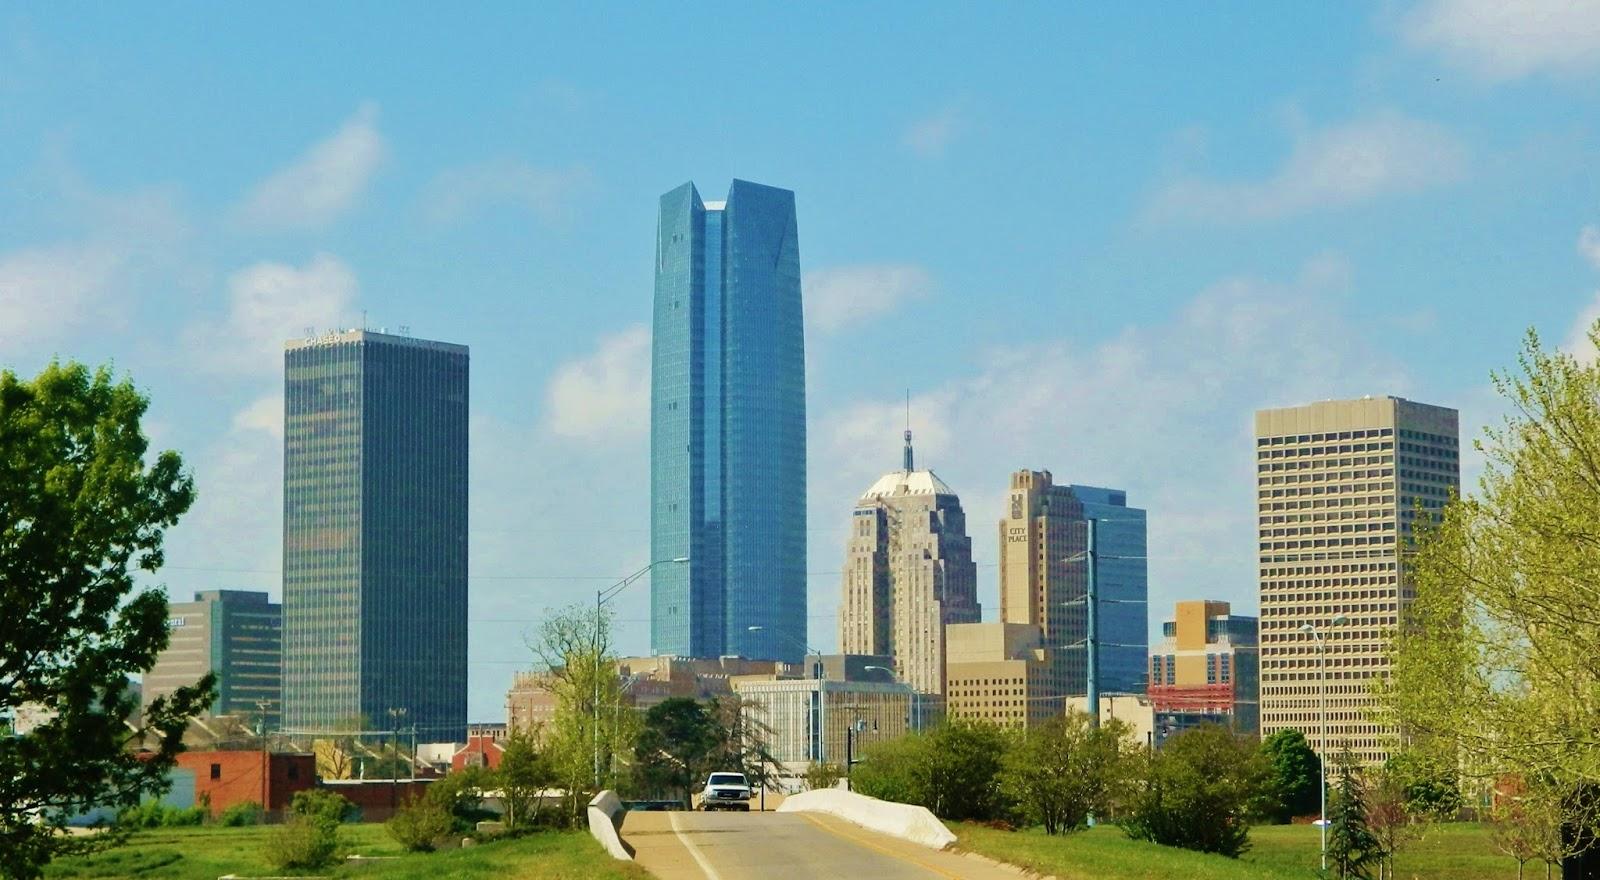 Oklahoma City | Oklahoma | Estados Unidos da América